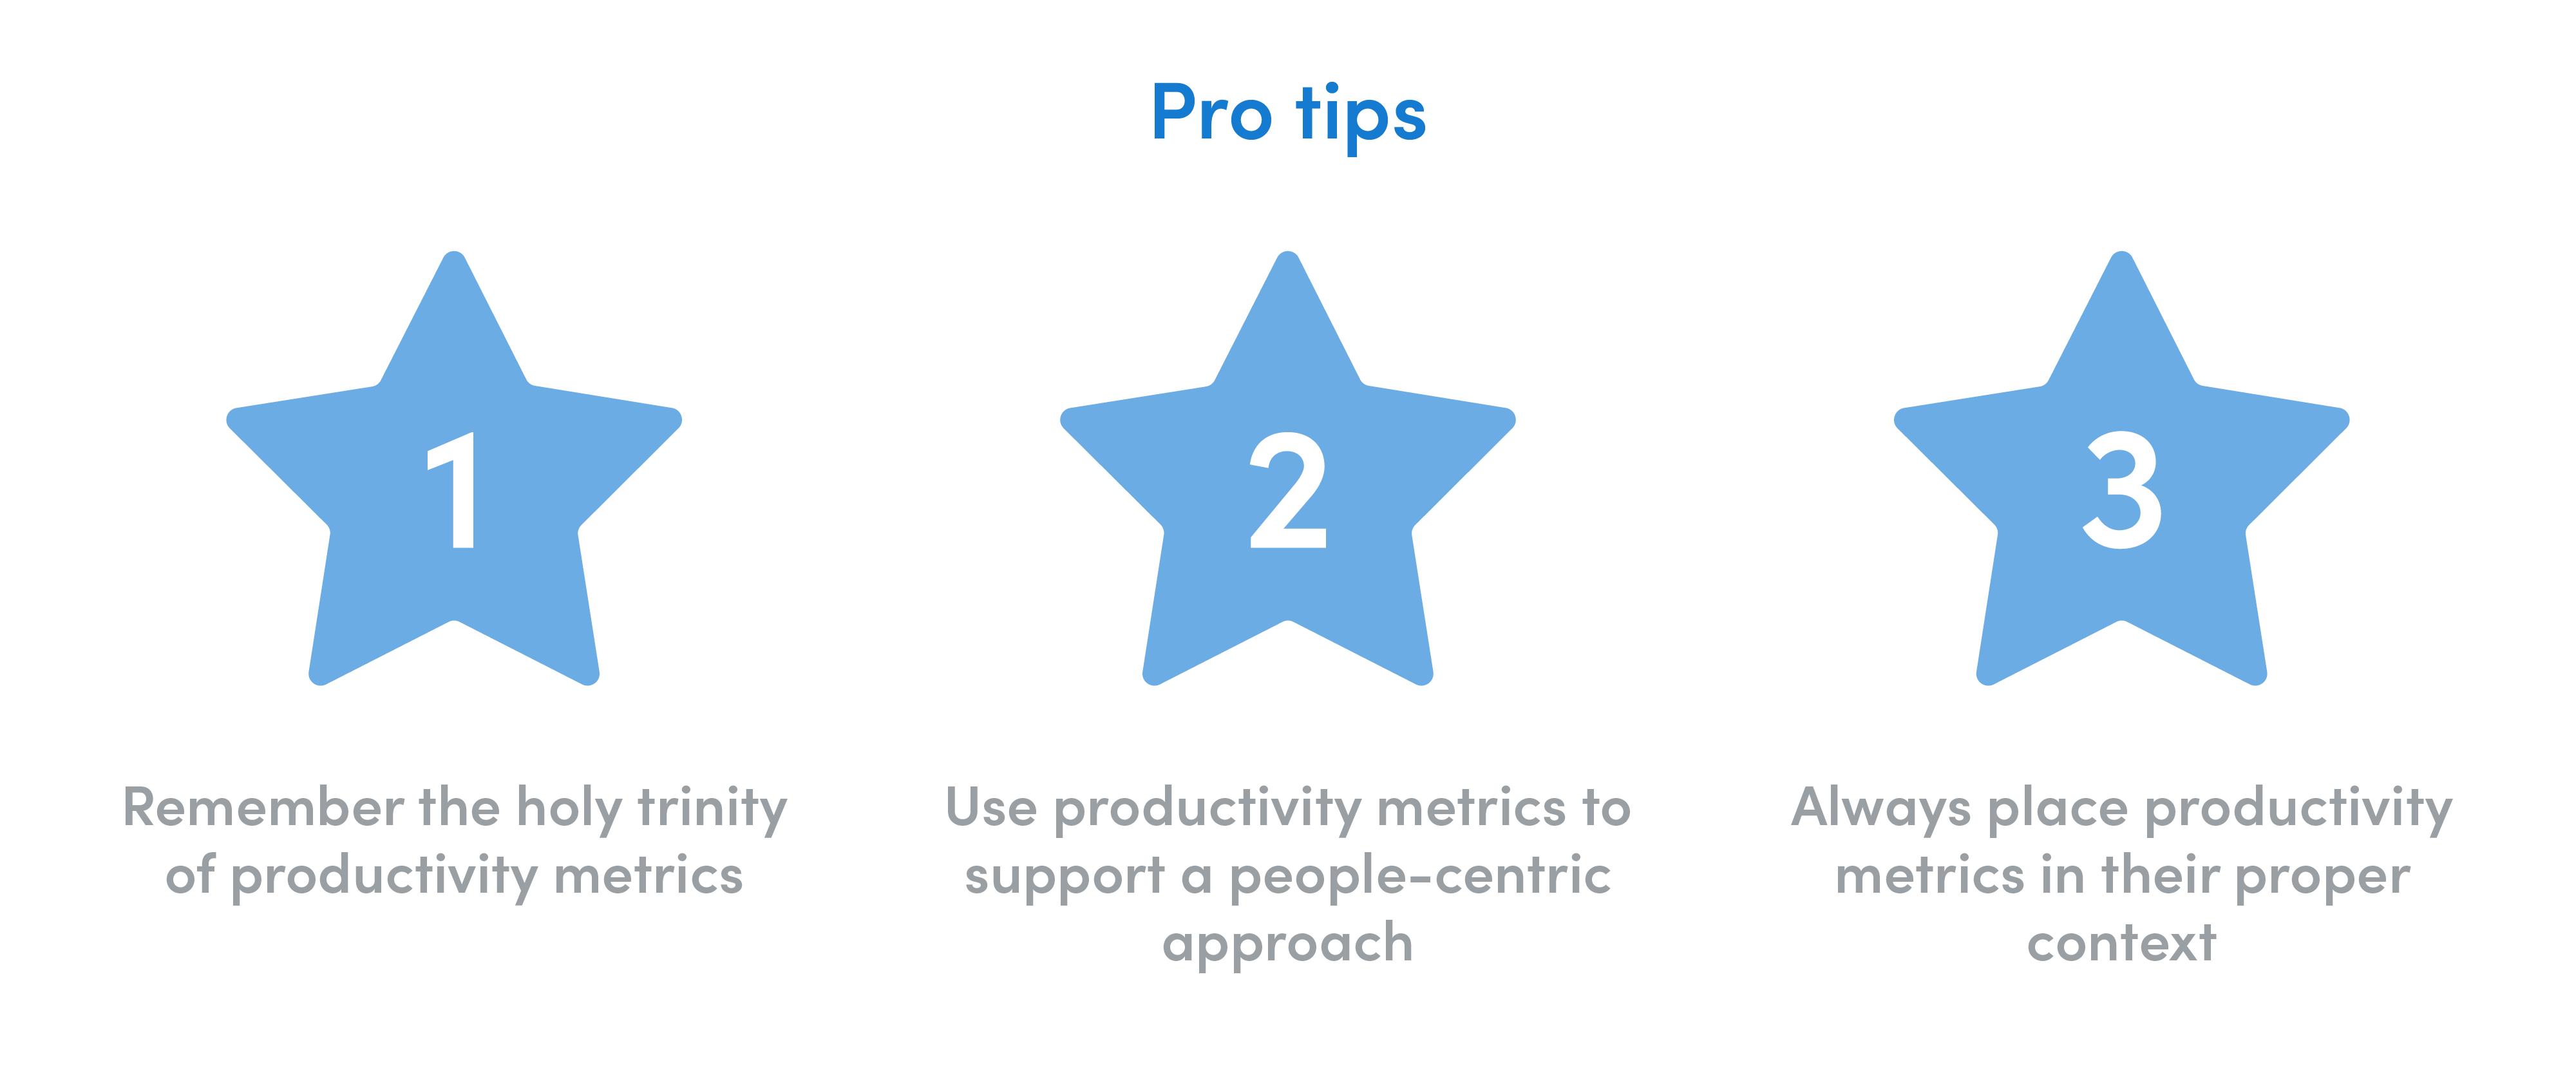 pro tips for creating productivity metrics